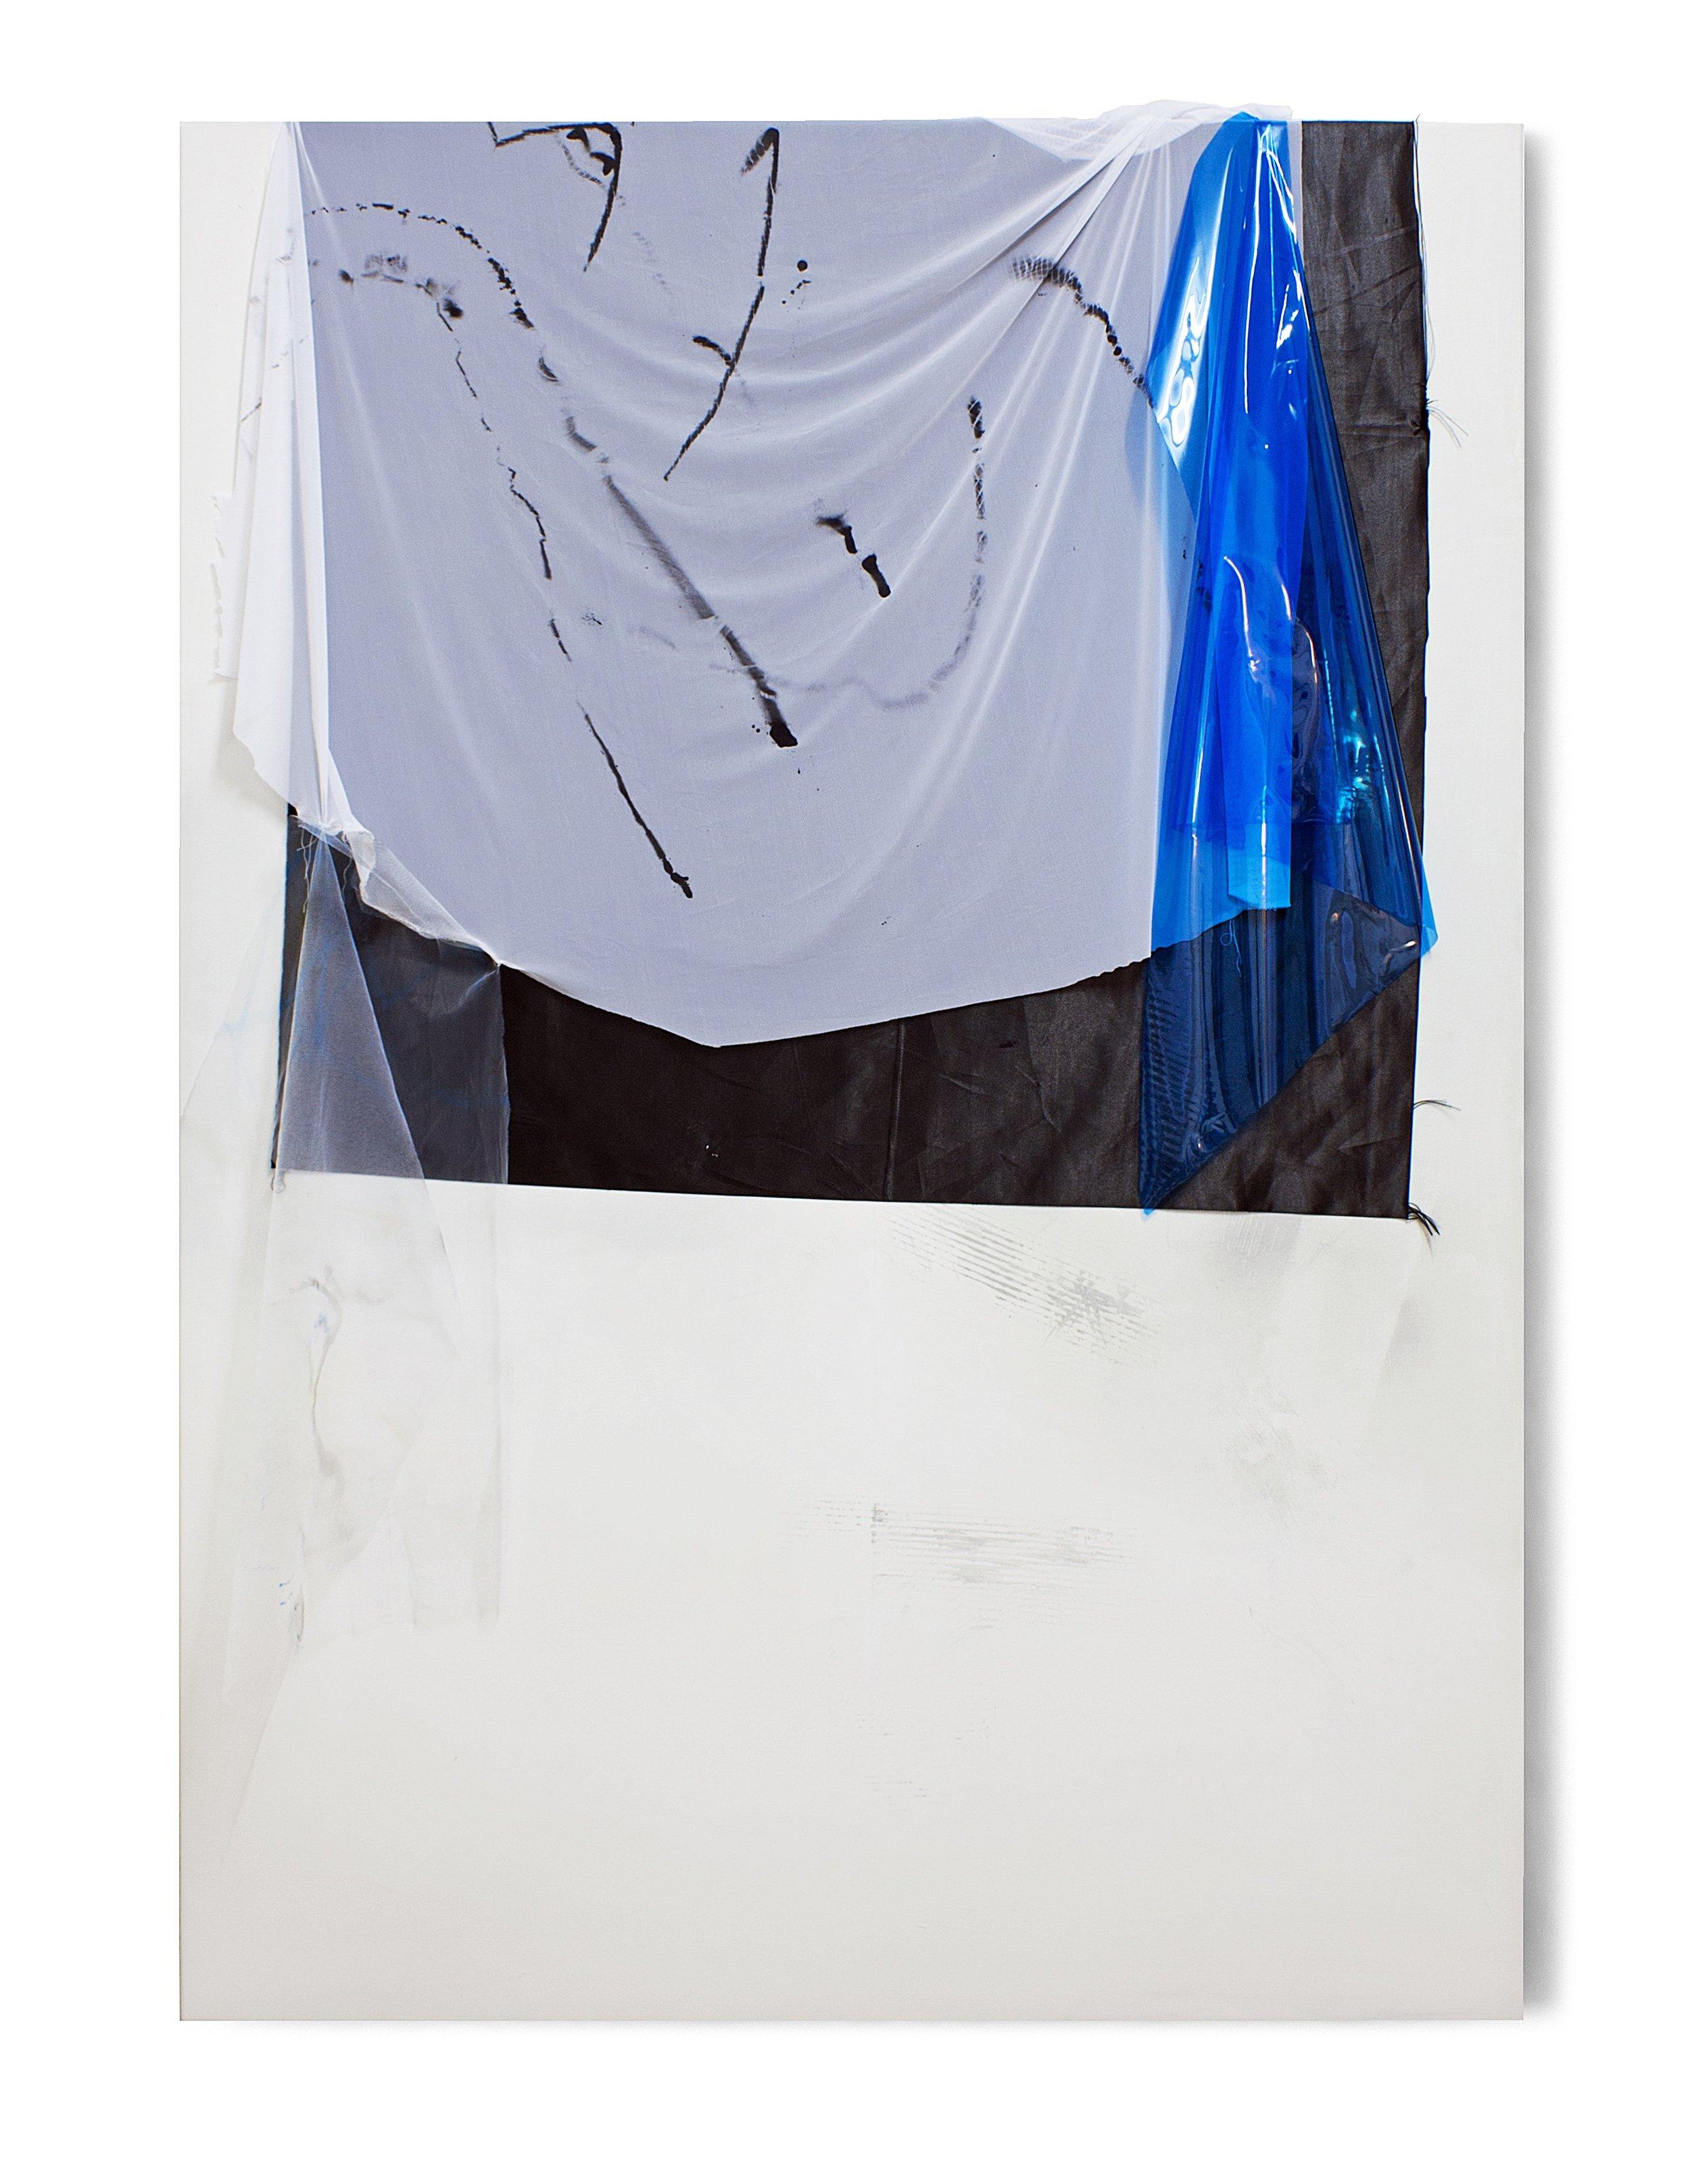 181006 | 2016 | Acryl, Lack, Sprühfarbe, PE Folie auf Leinwand | 185 x 135 cm | ©GALERIE ALBER